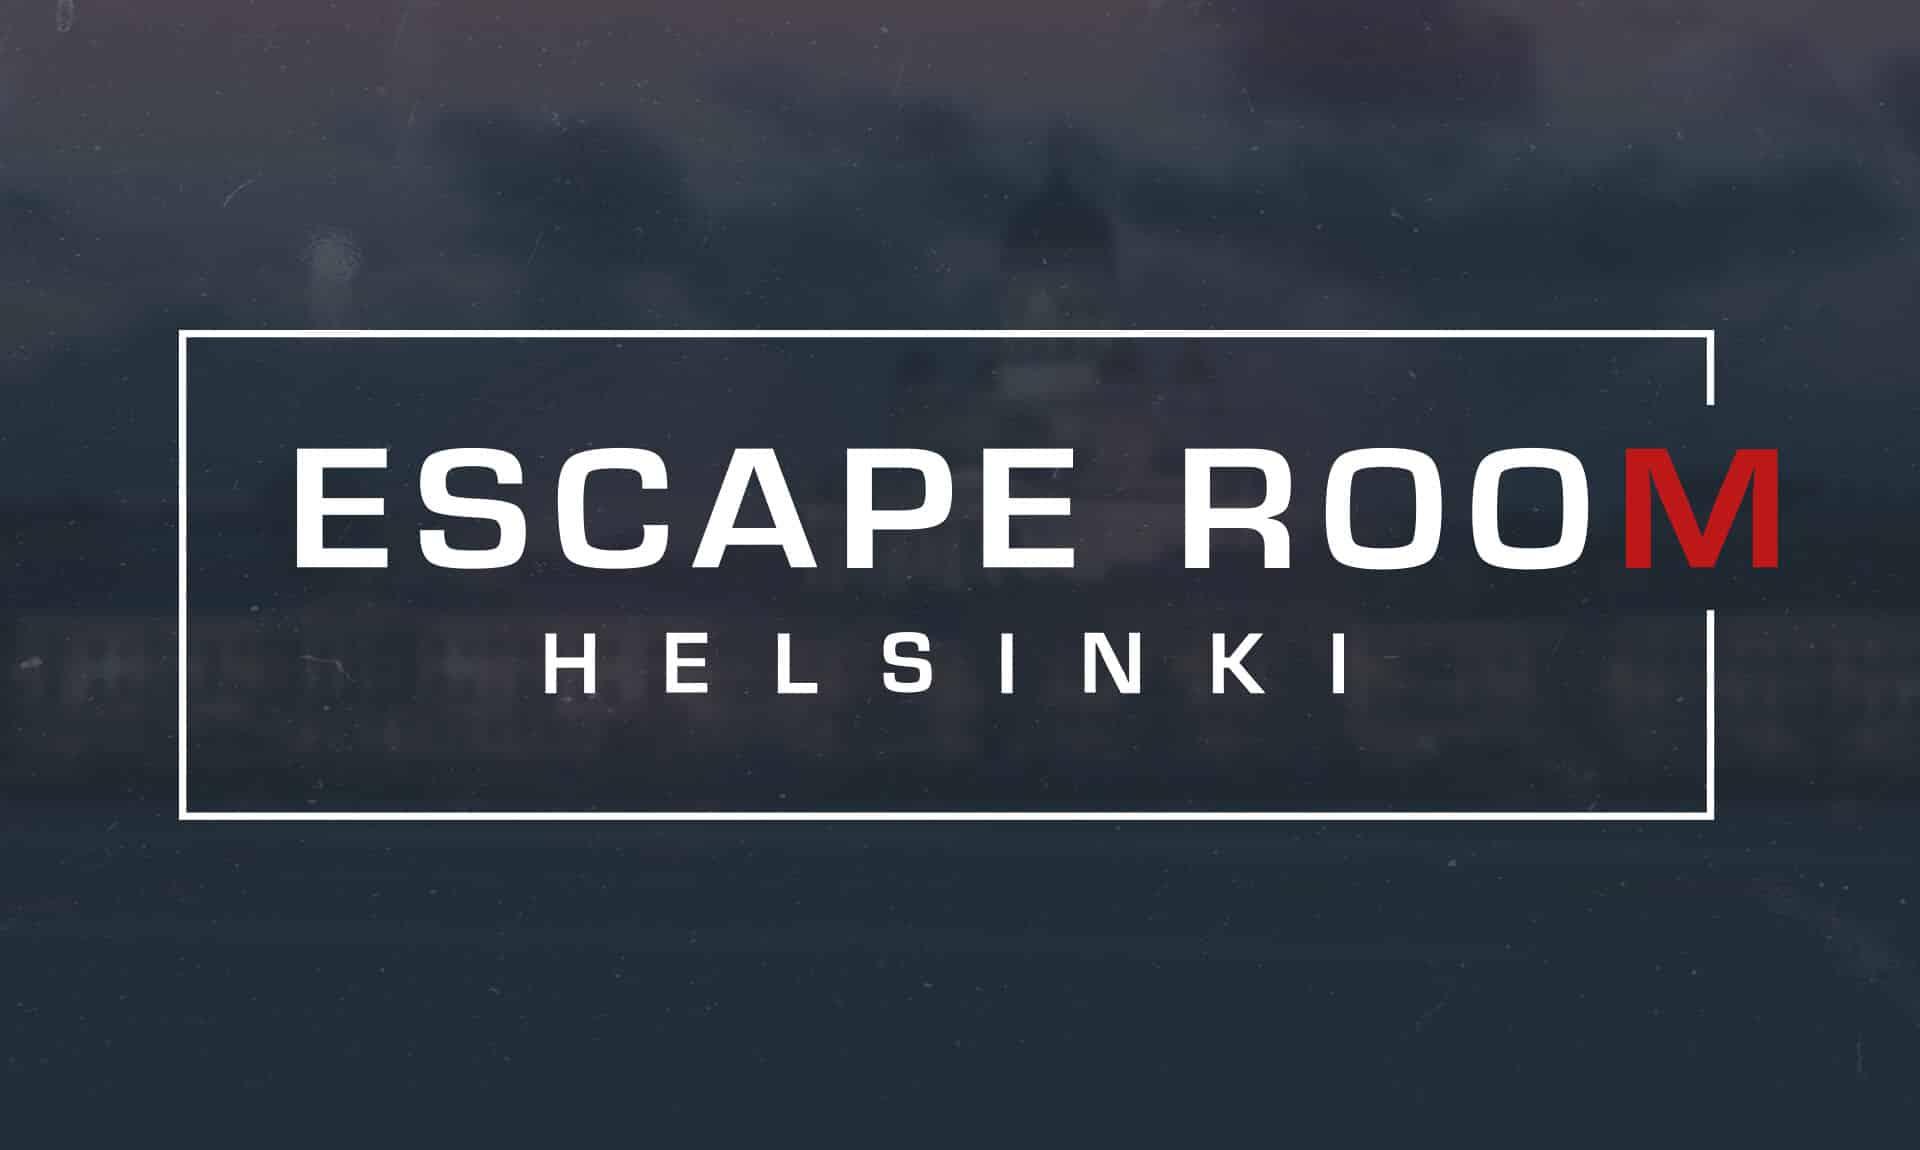 Escape Room Helsinki ® - Escape room games in the heart of Helsinki